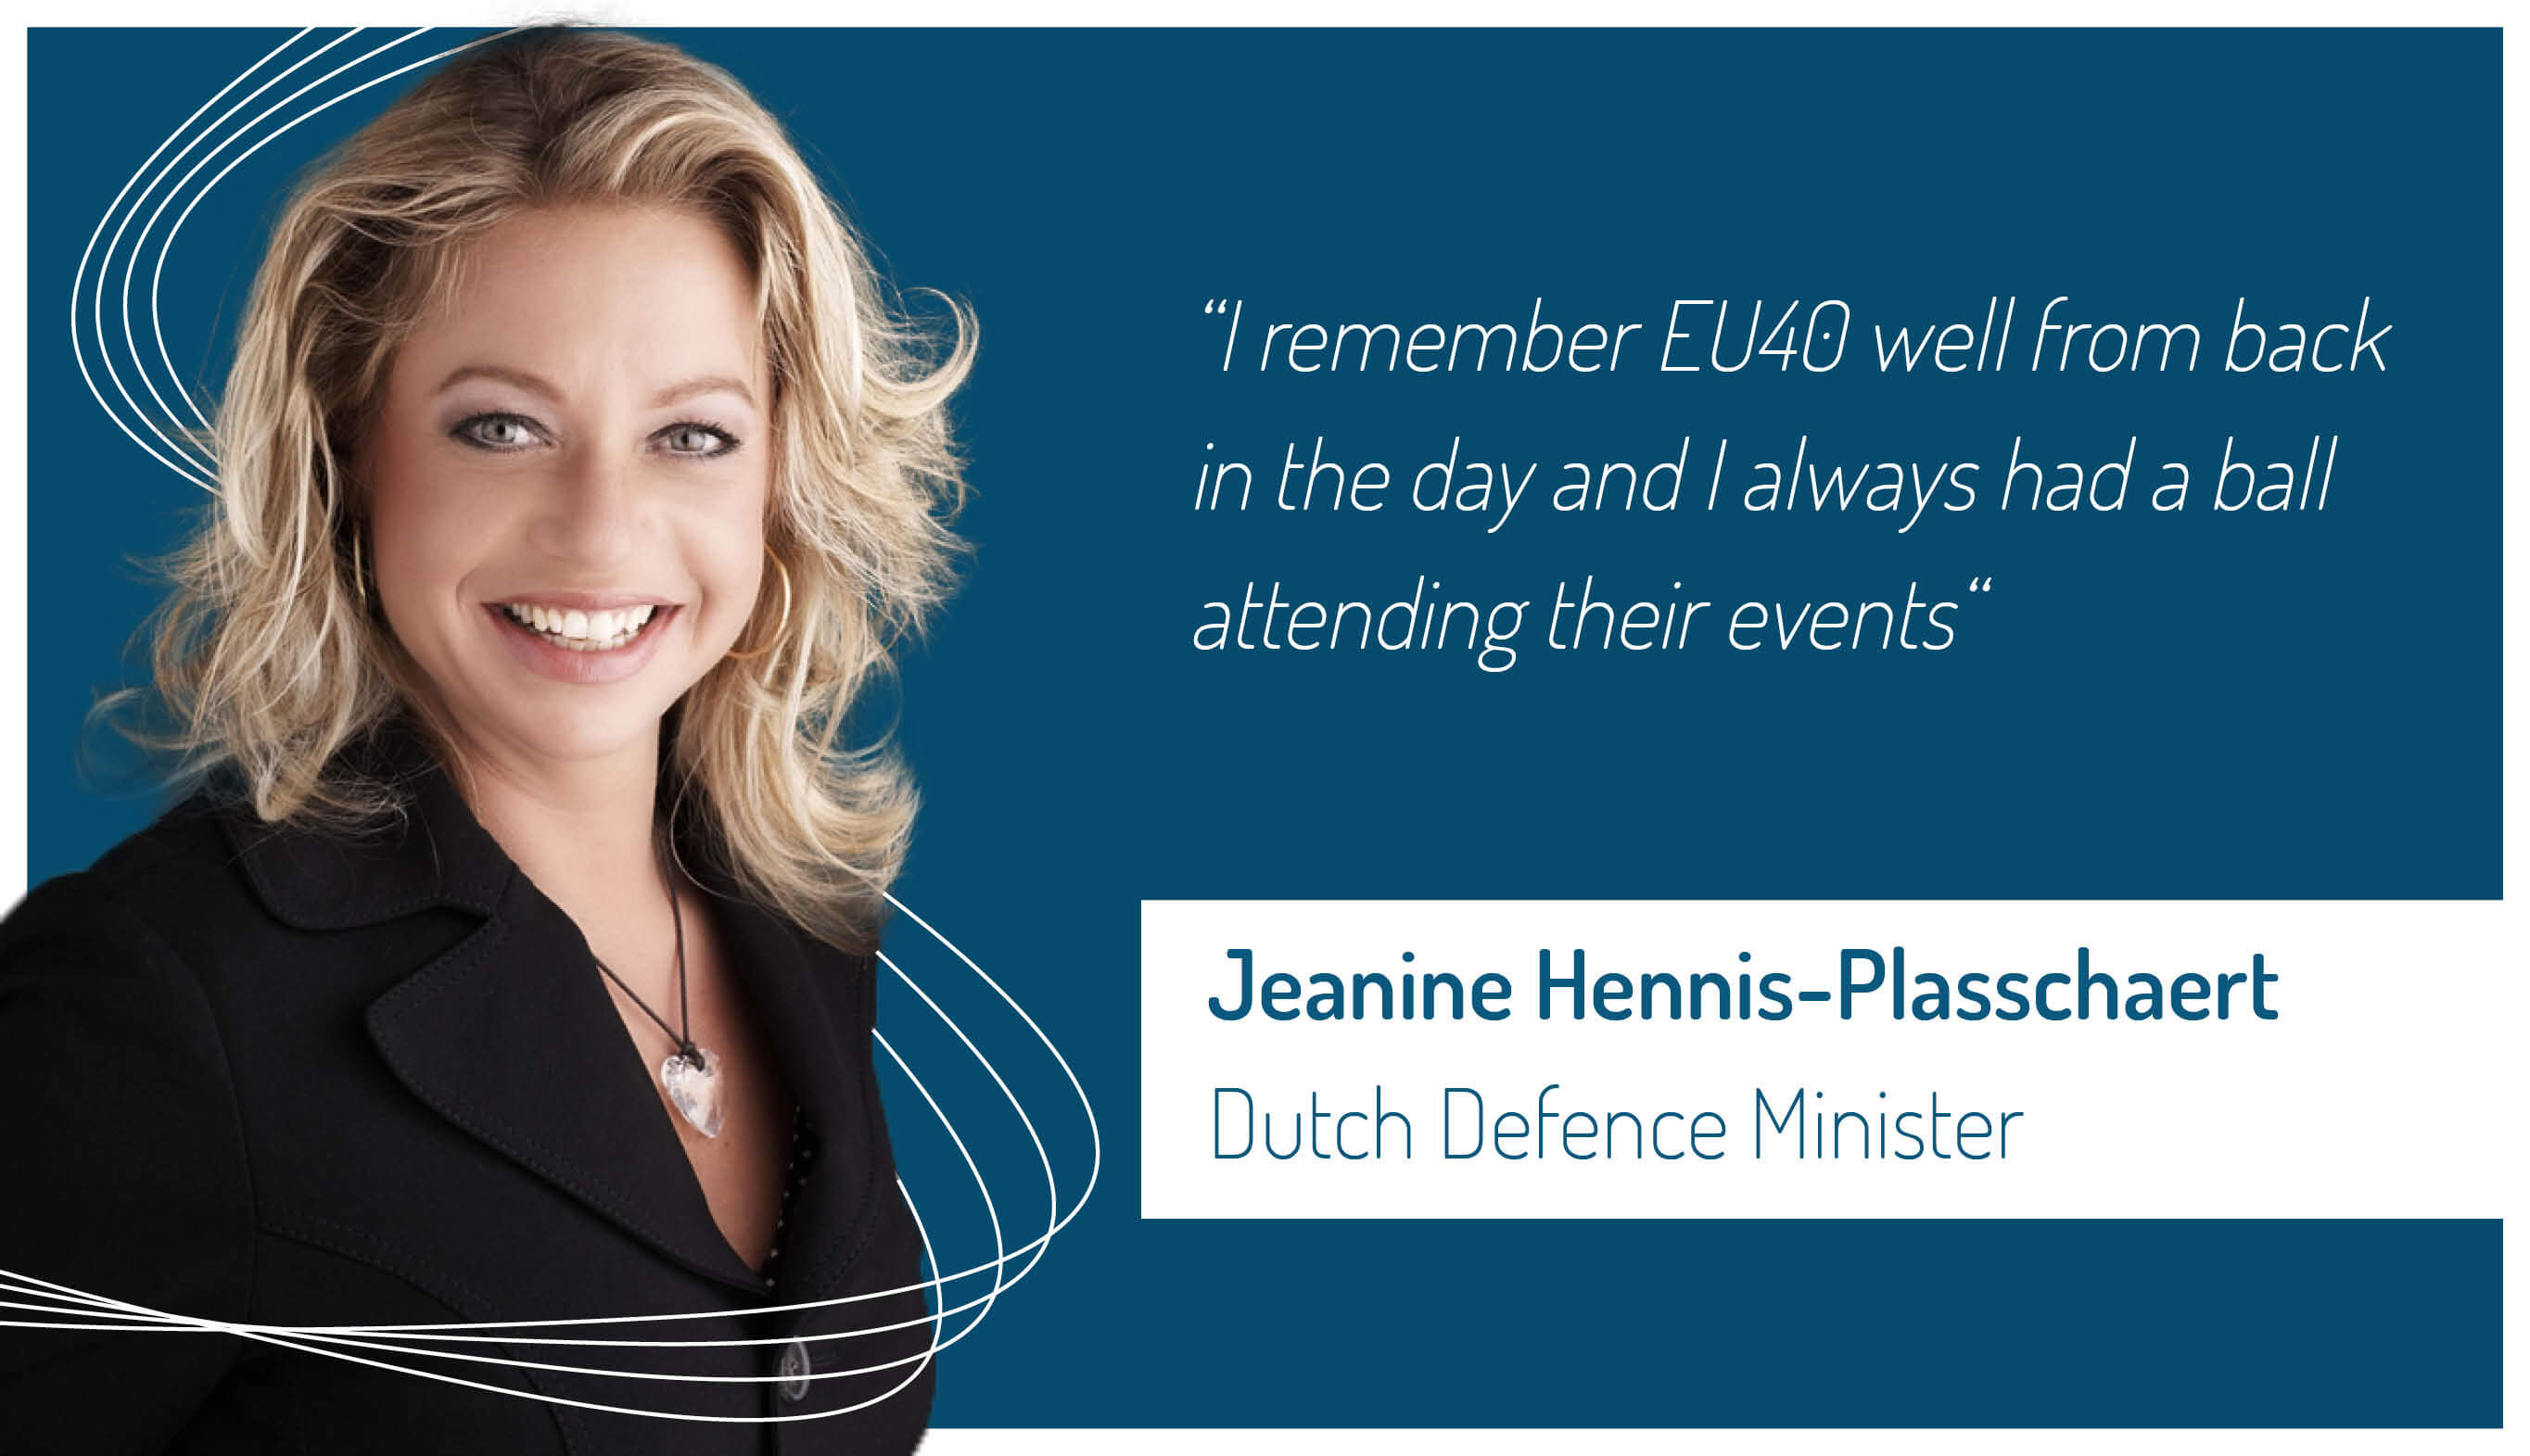 Eu40_JeaninePlasschaert_290917_V4 (1) (1)